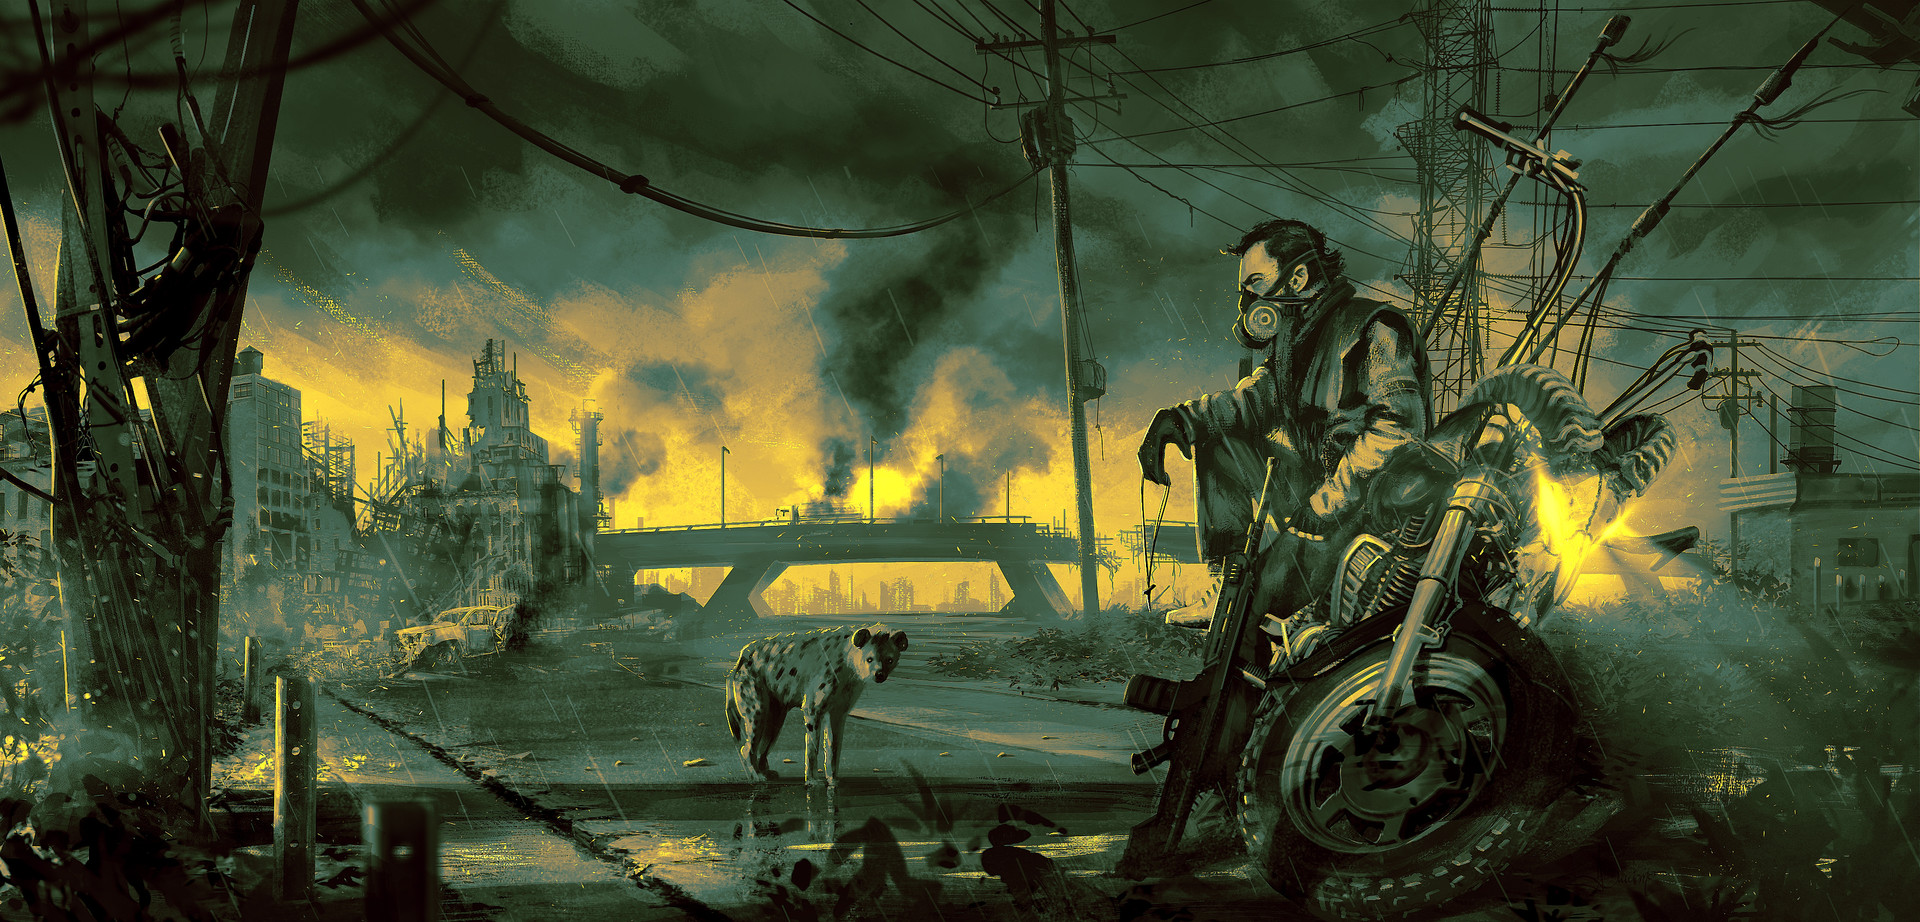 General 1920x922 apocalyptic war futuristic men motorcycle weapon hyenas city fan art digital art desolate illustration